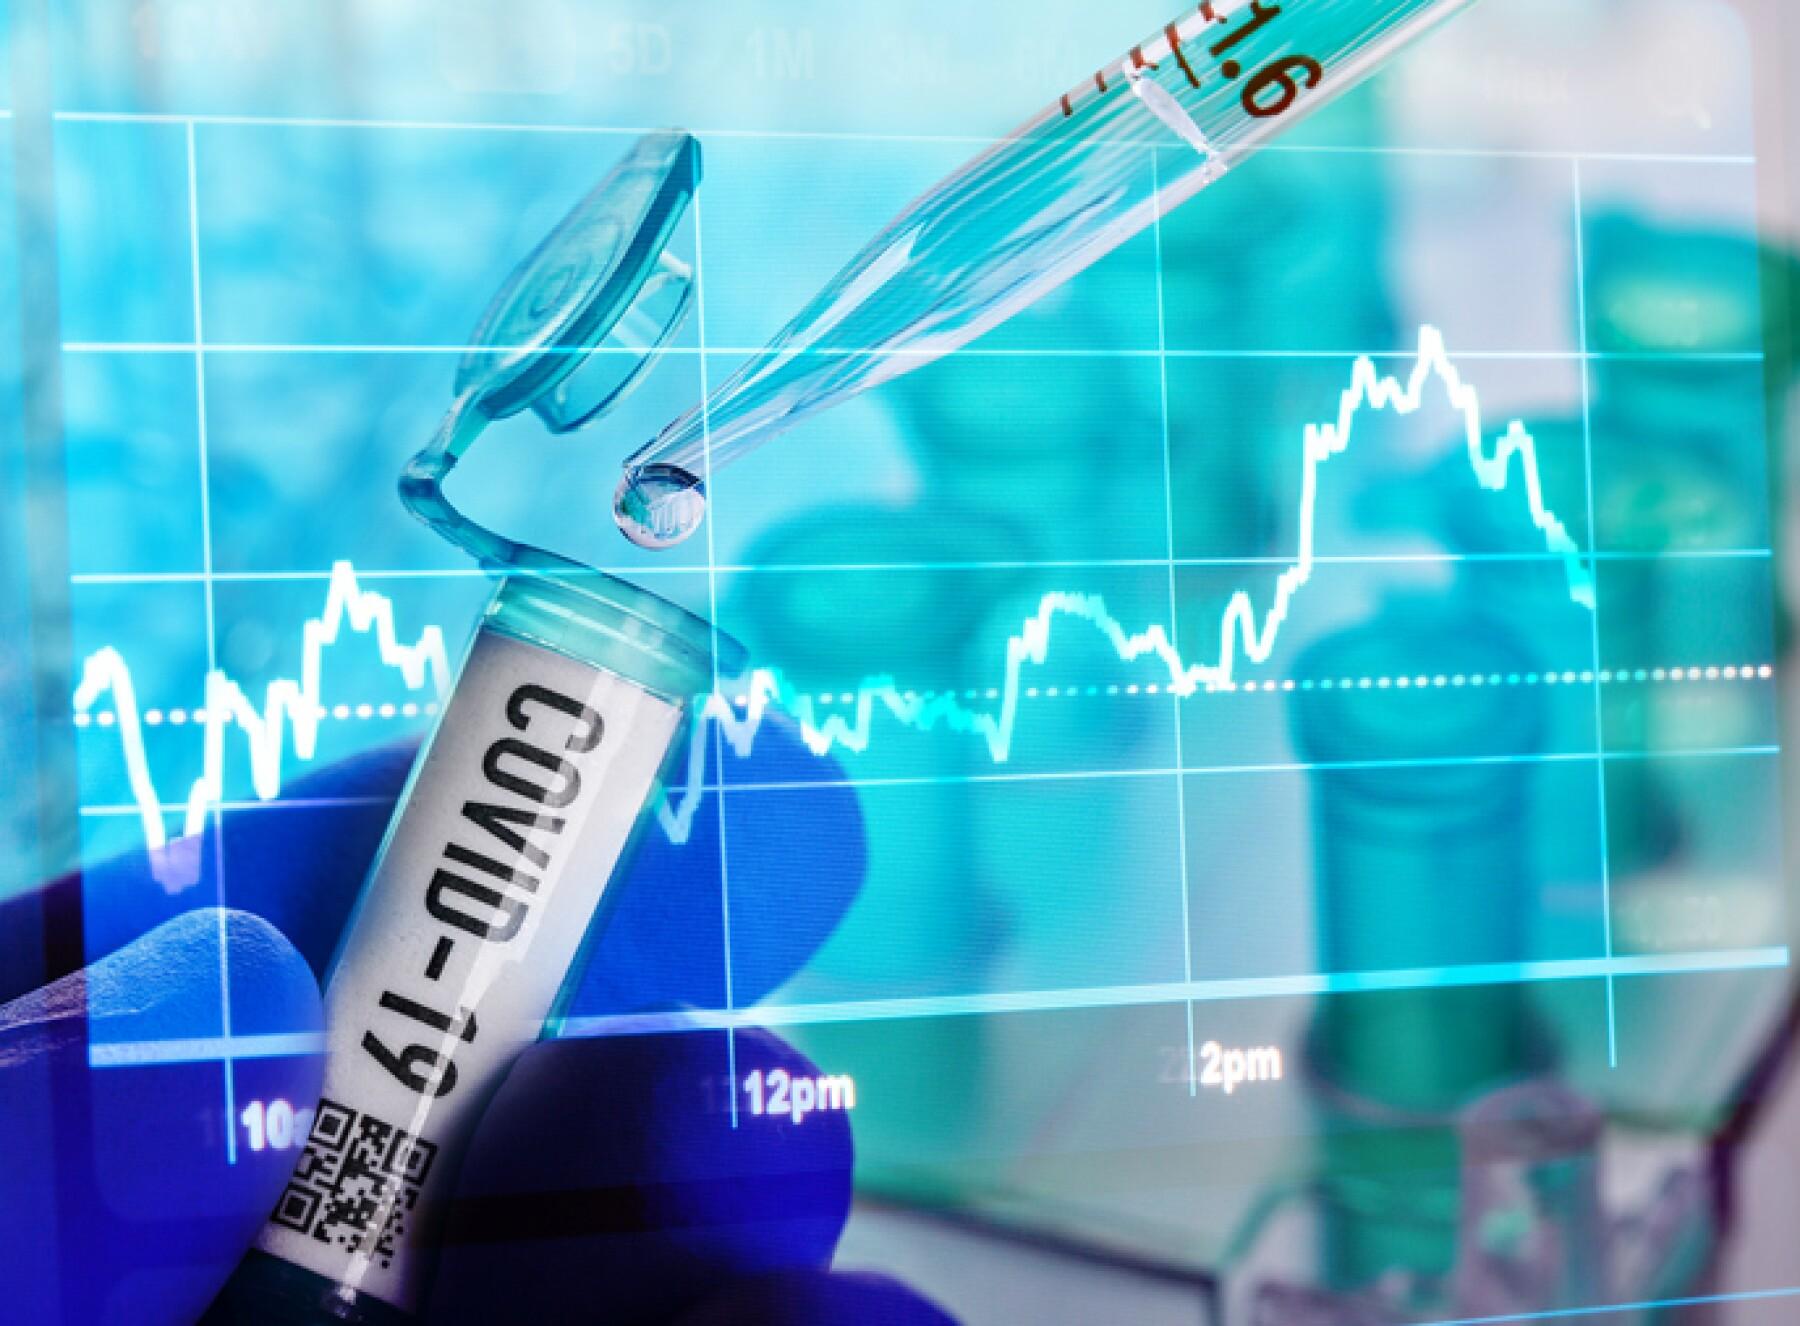 Corona virus: vial with corona virus, and stock chart covid-19